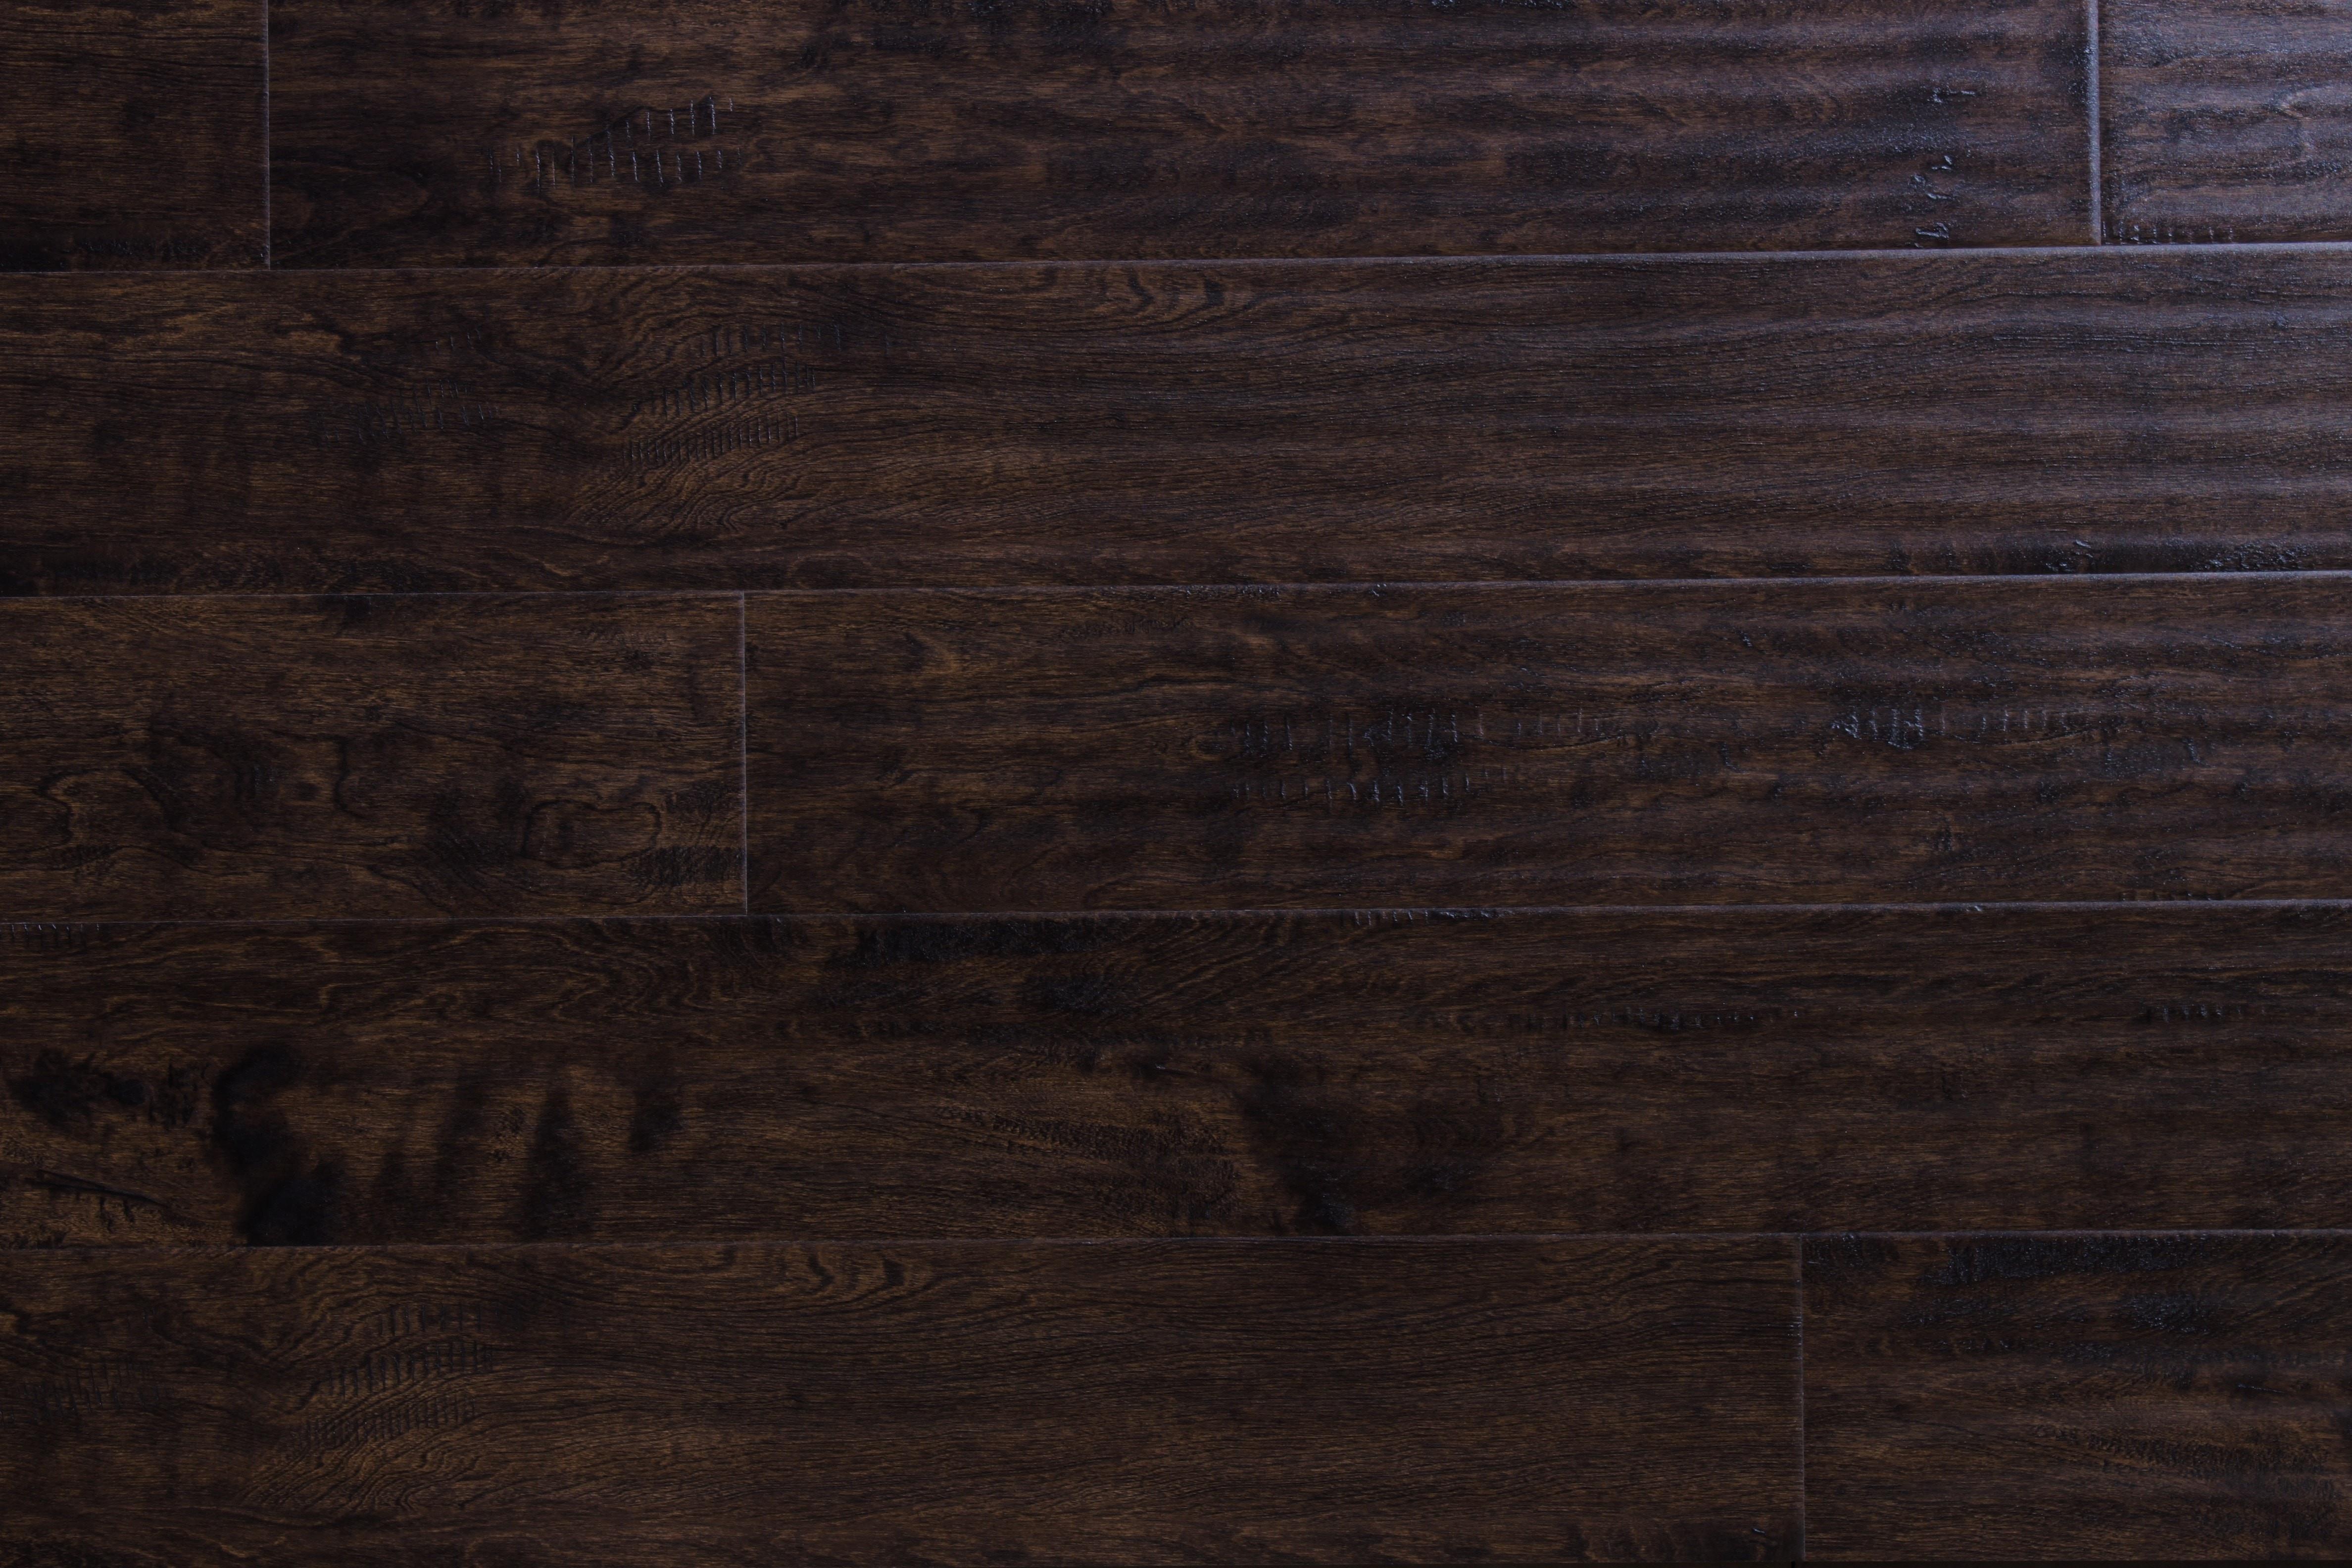 laminate wood flooring versus hardwood flooring of wood flooring free samples available at builddirecta pertaining to tailor multi gb 5874277bb8d3c